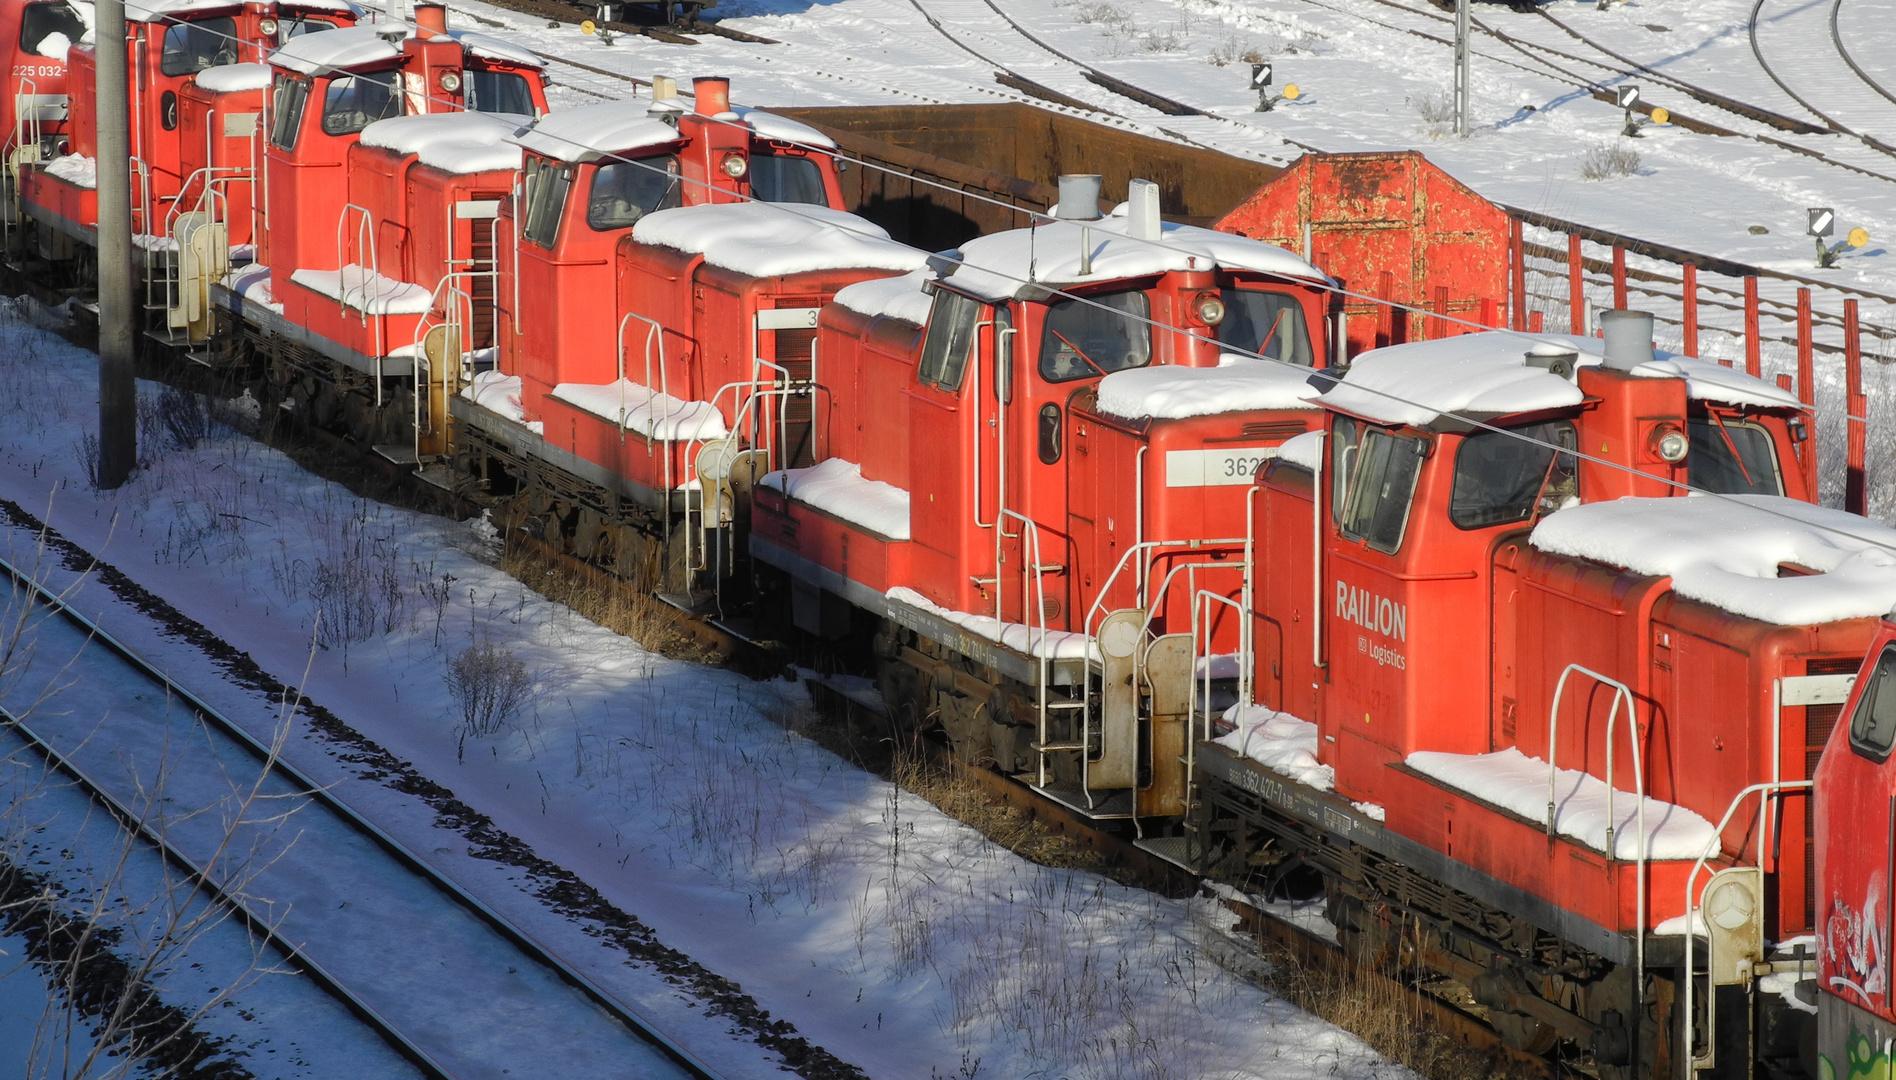 RAILION Logistics